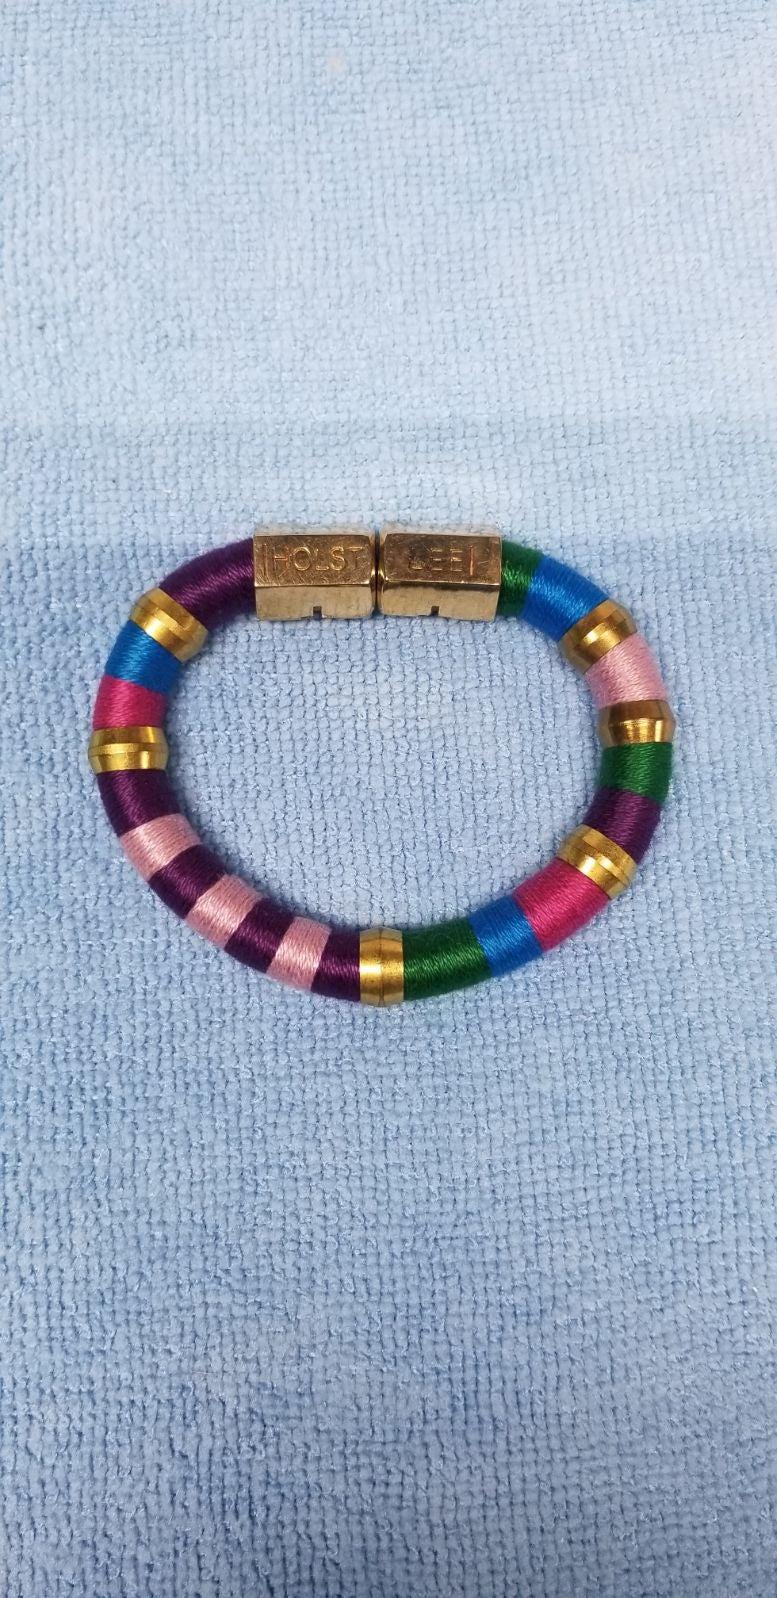 Holst Lee Bracelet